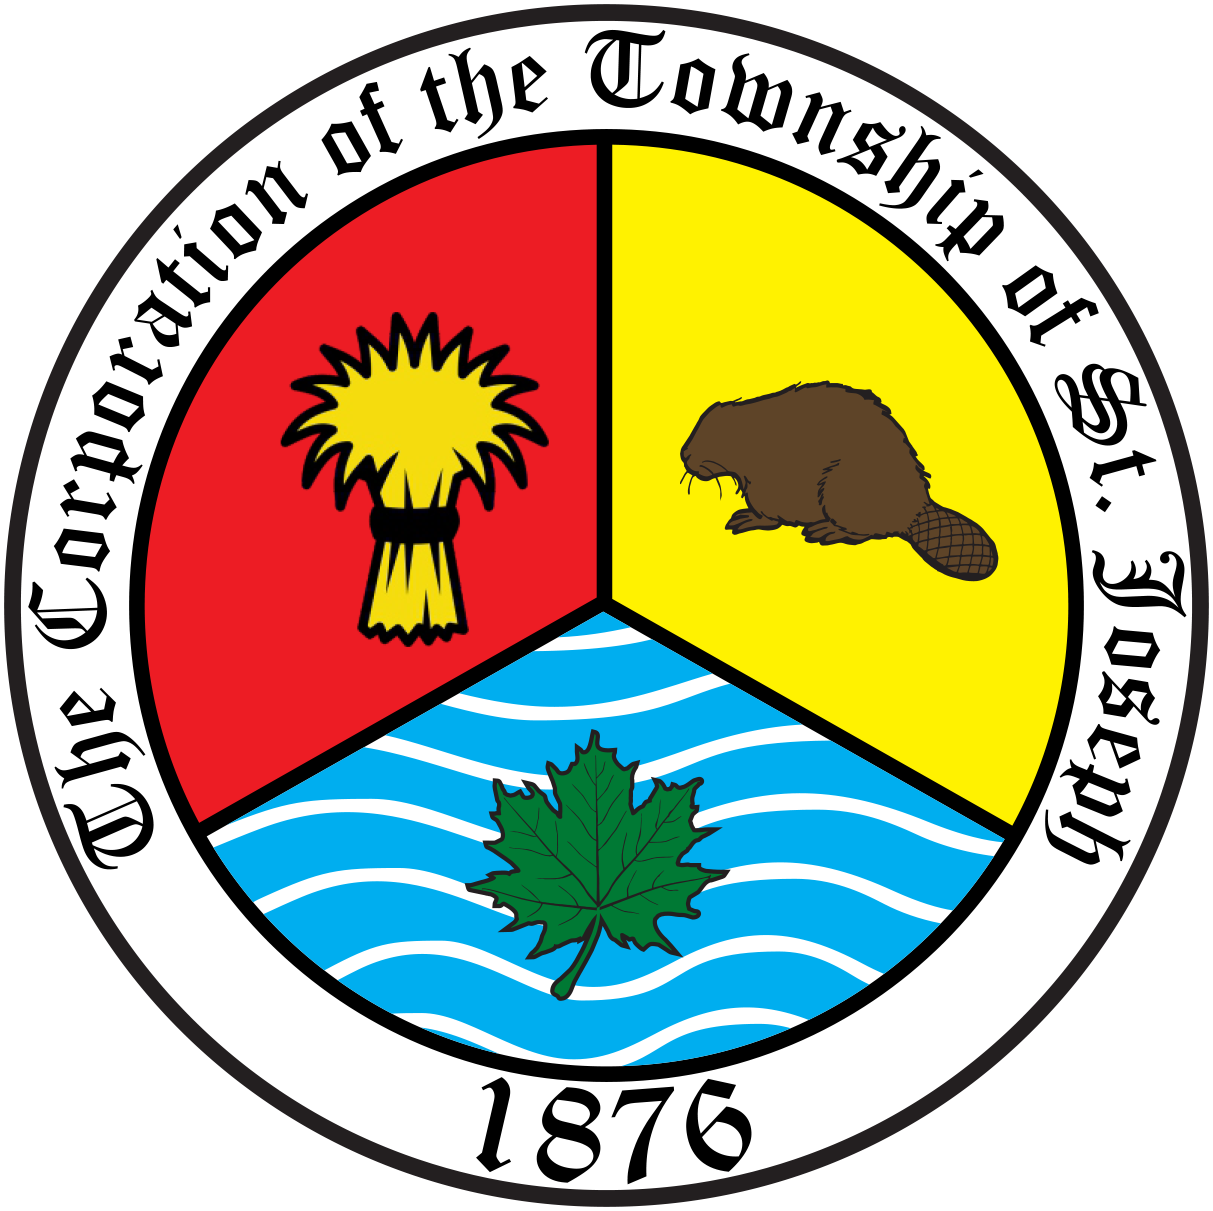 Township of St. Joseph